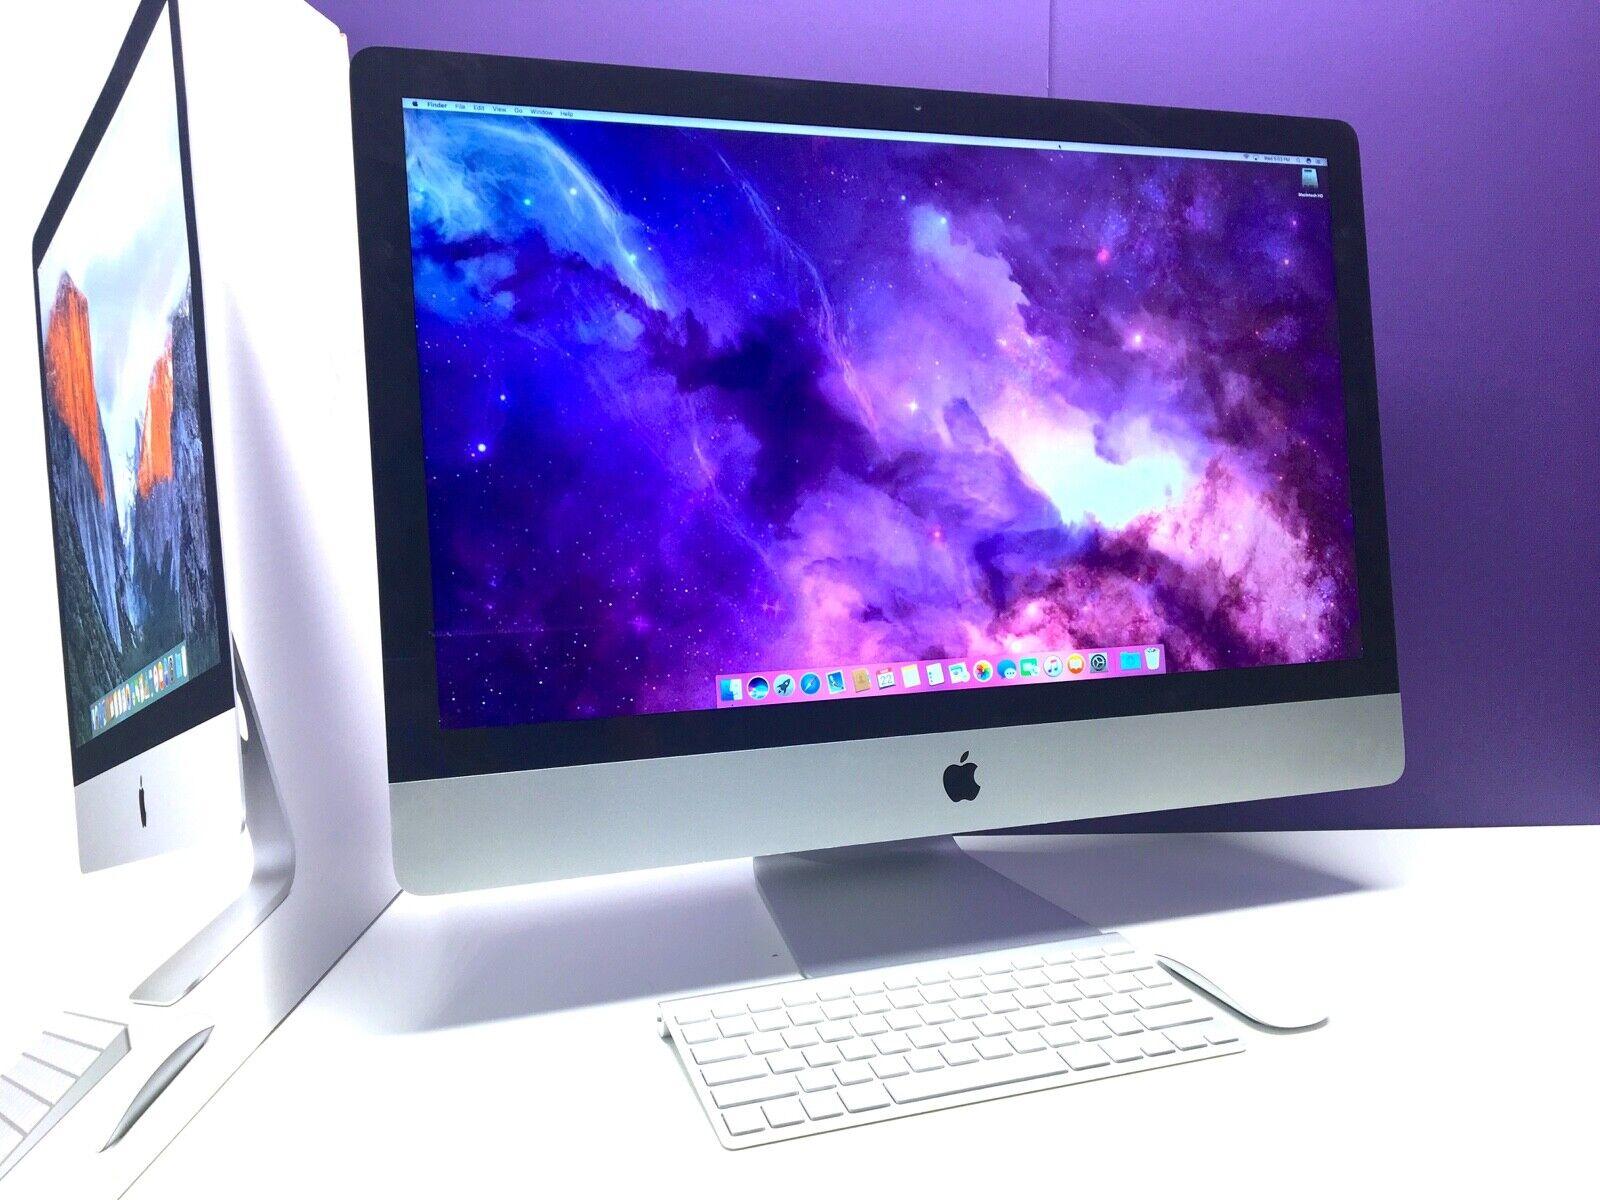 Apple iMac 27 SLIM Display | i7 QUAD | 1TB SSD 32GB | All-in-One Desktop OS2020. Buy it now for 1249.00